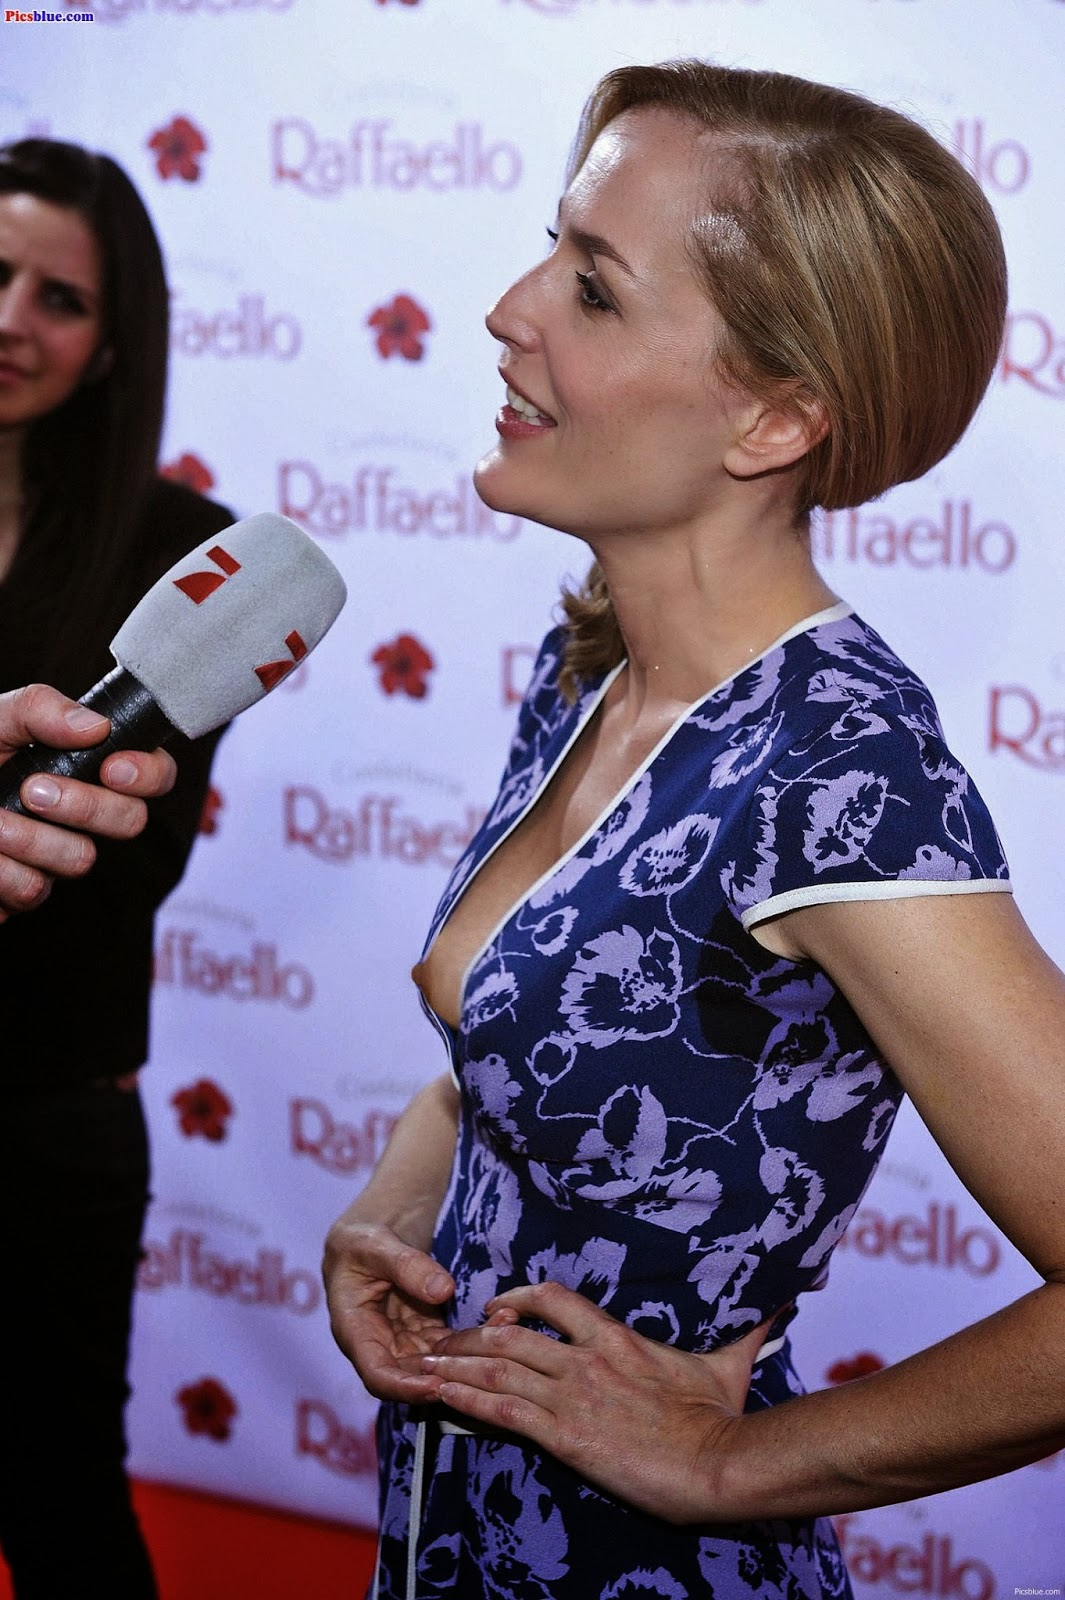 Gillian Anderson Nip slip